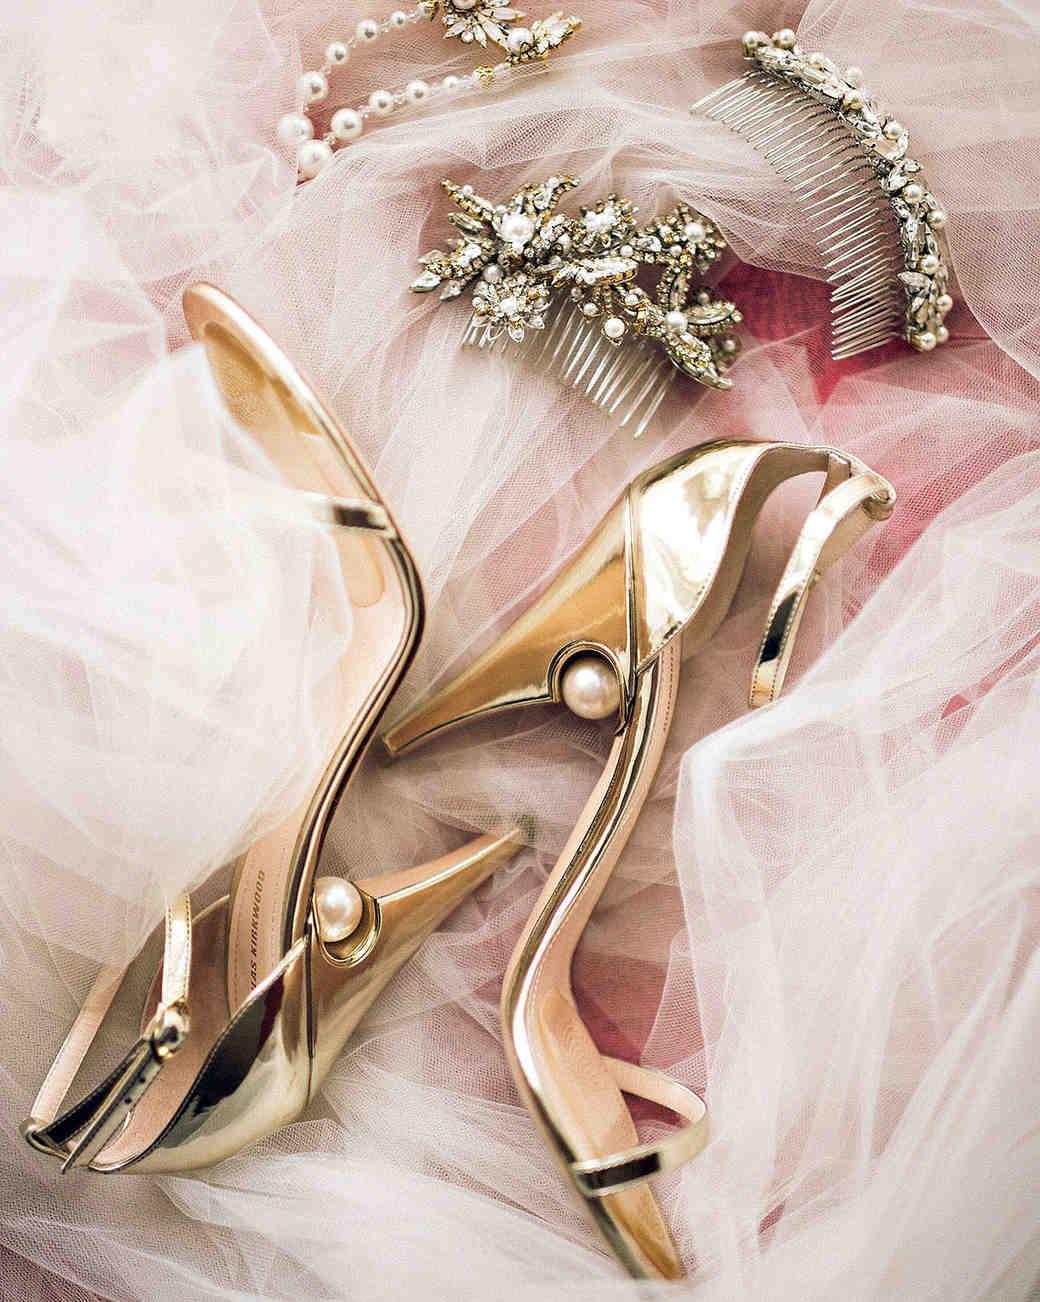 porsha terry wedding jamaica nicholas kirkwood shoes